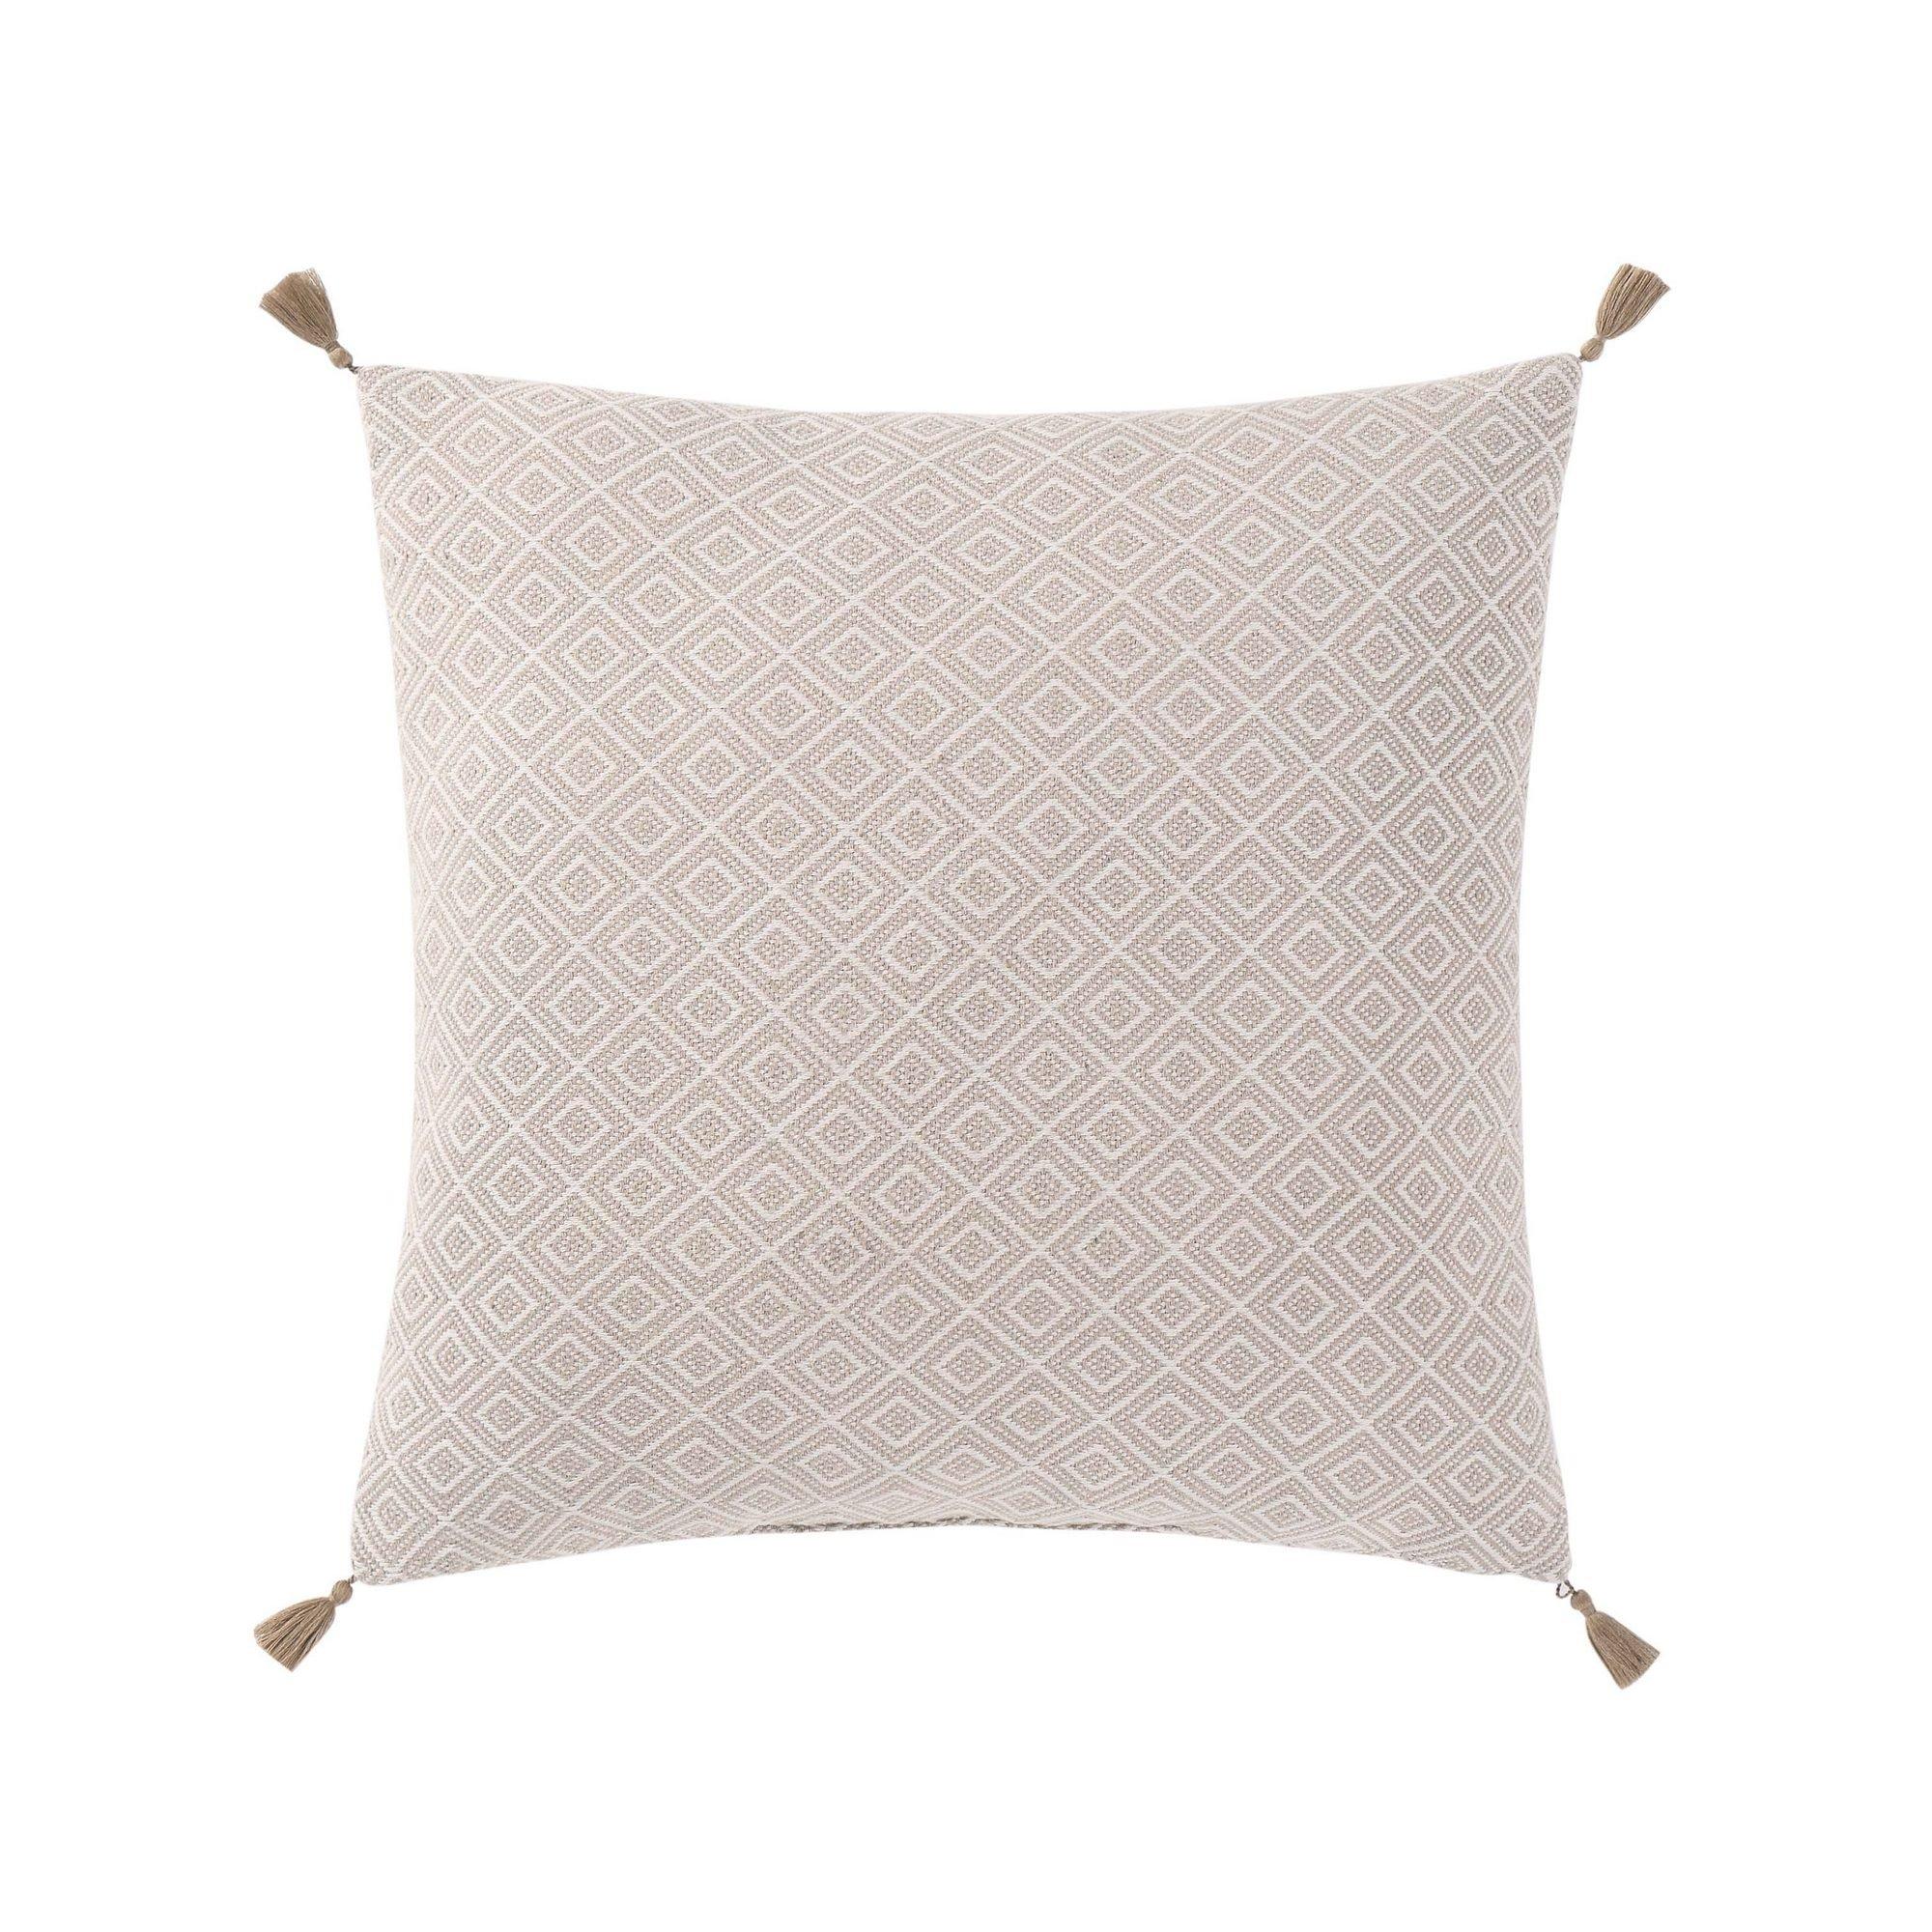 Oceanfront Resort CF2364NTDP-1400 Decorative Pillow, White/Gray